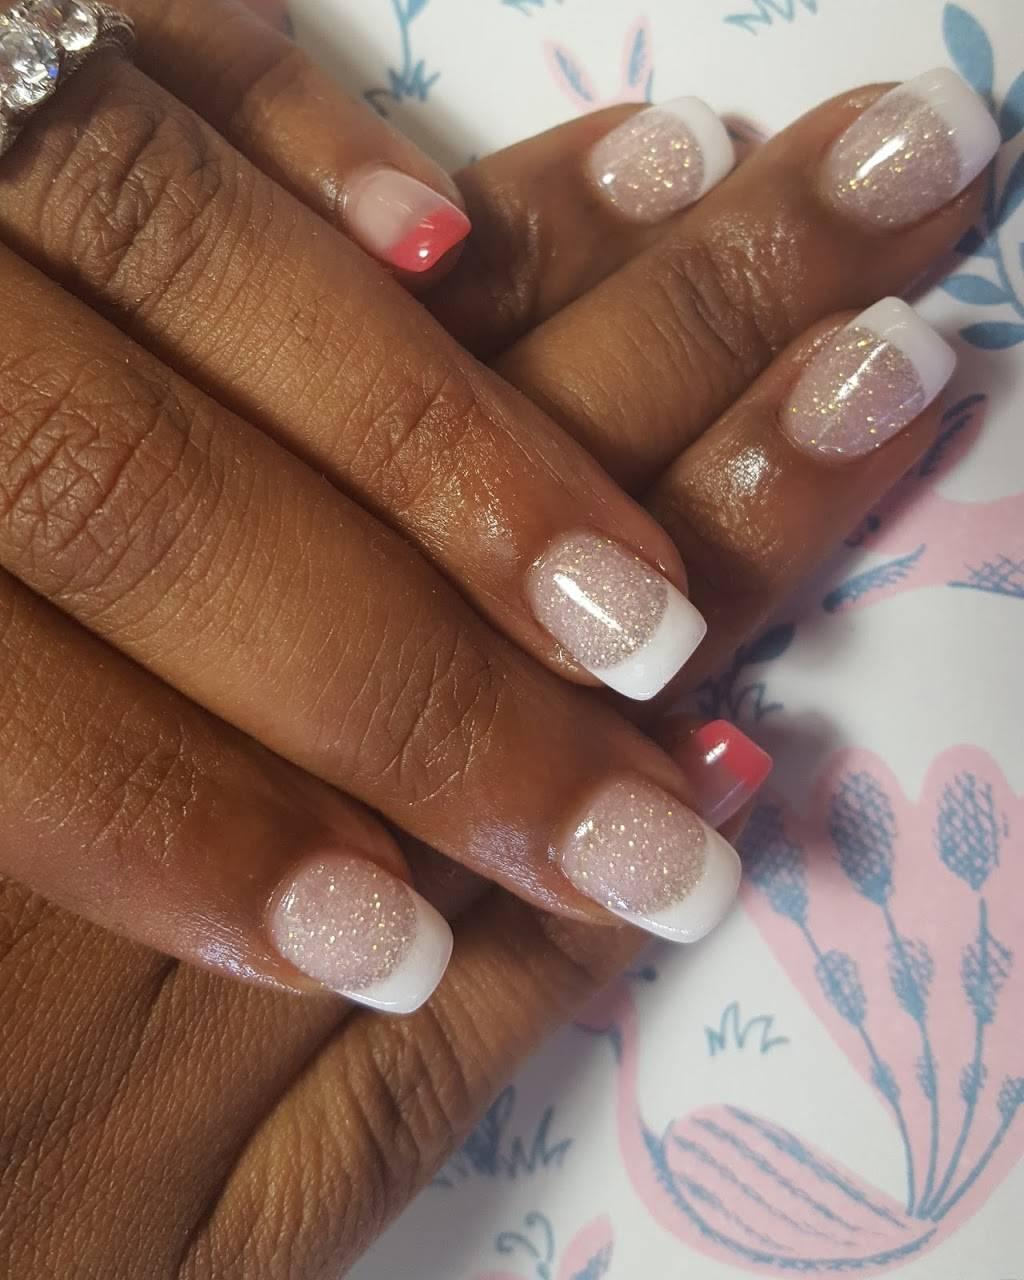 Anns Nails and Spa Jax - spa  | Photo 6 of 8 | Address: 6625 Argyle Forest Blvd, Jacksonville, FL 32244, USA | Phone: (904) 619-7273